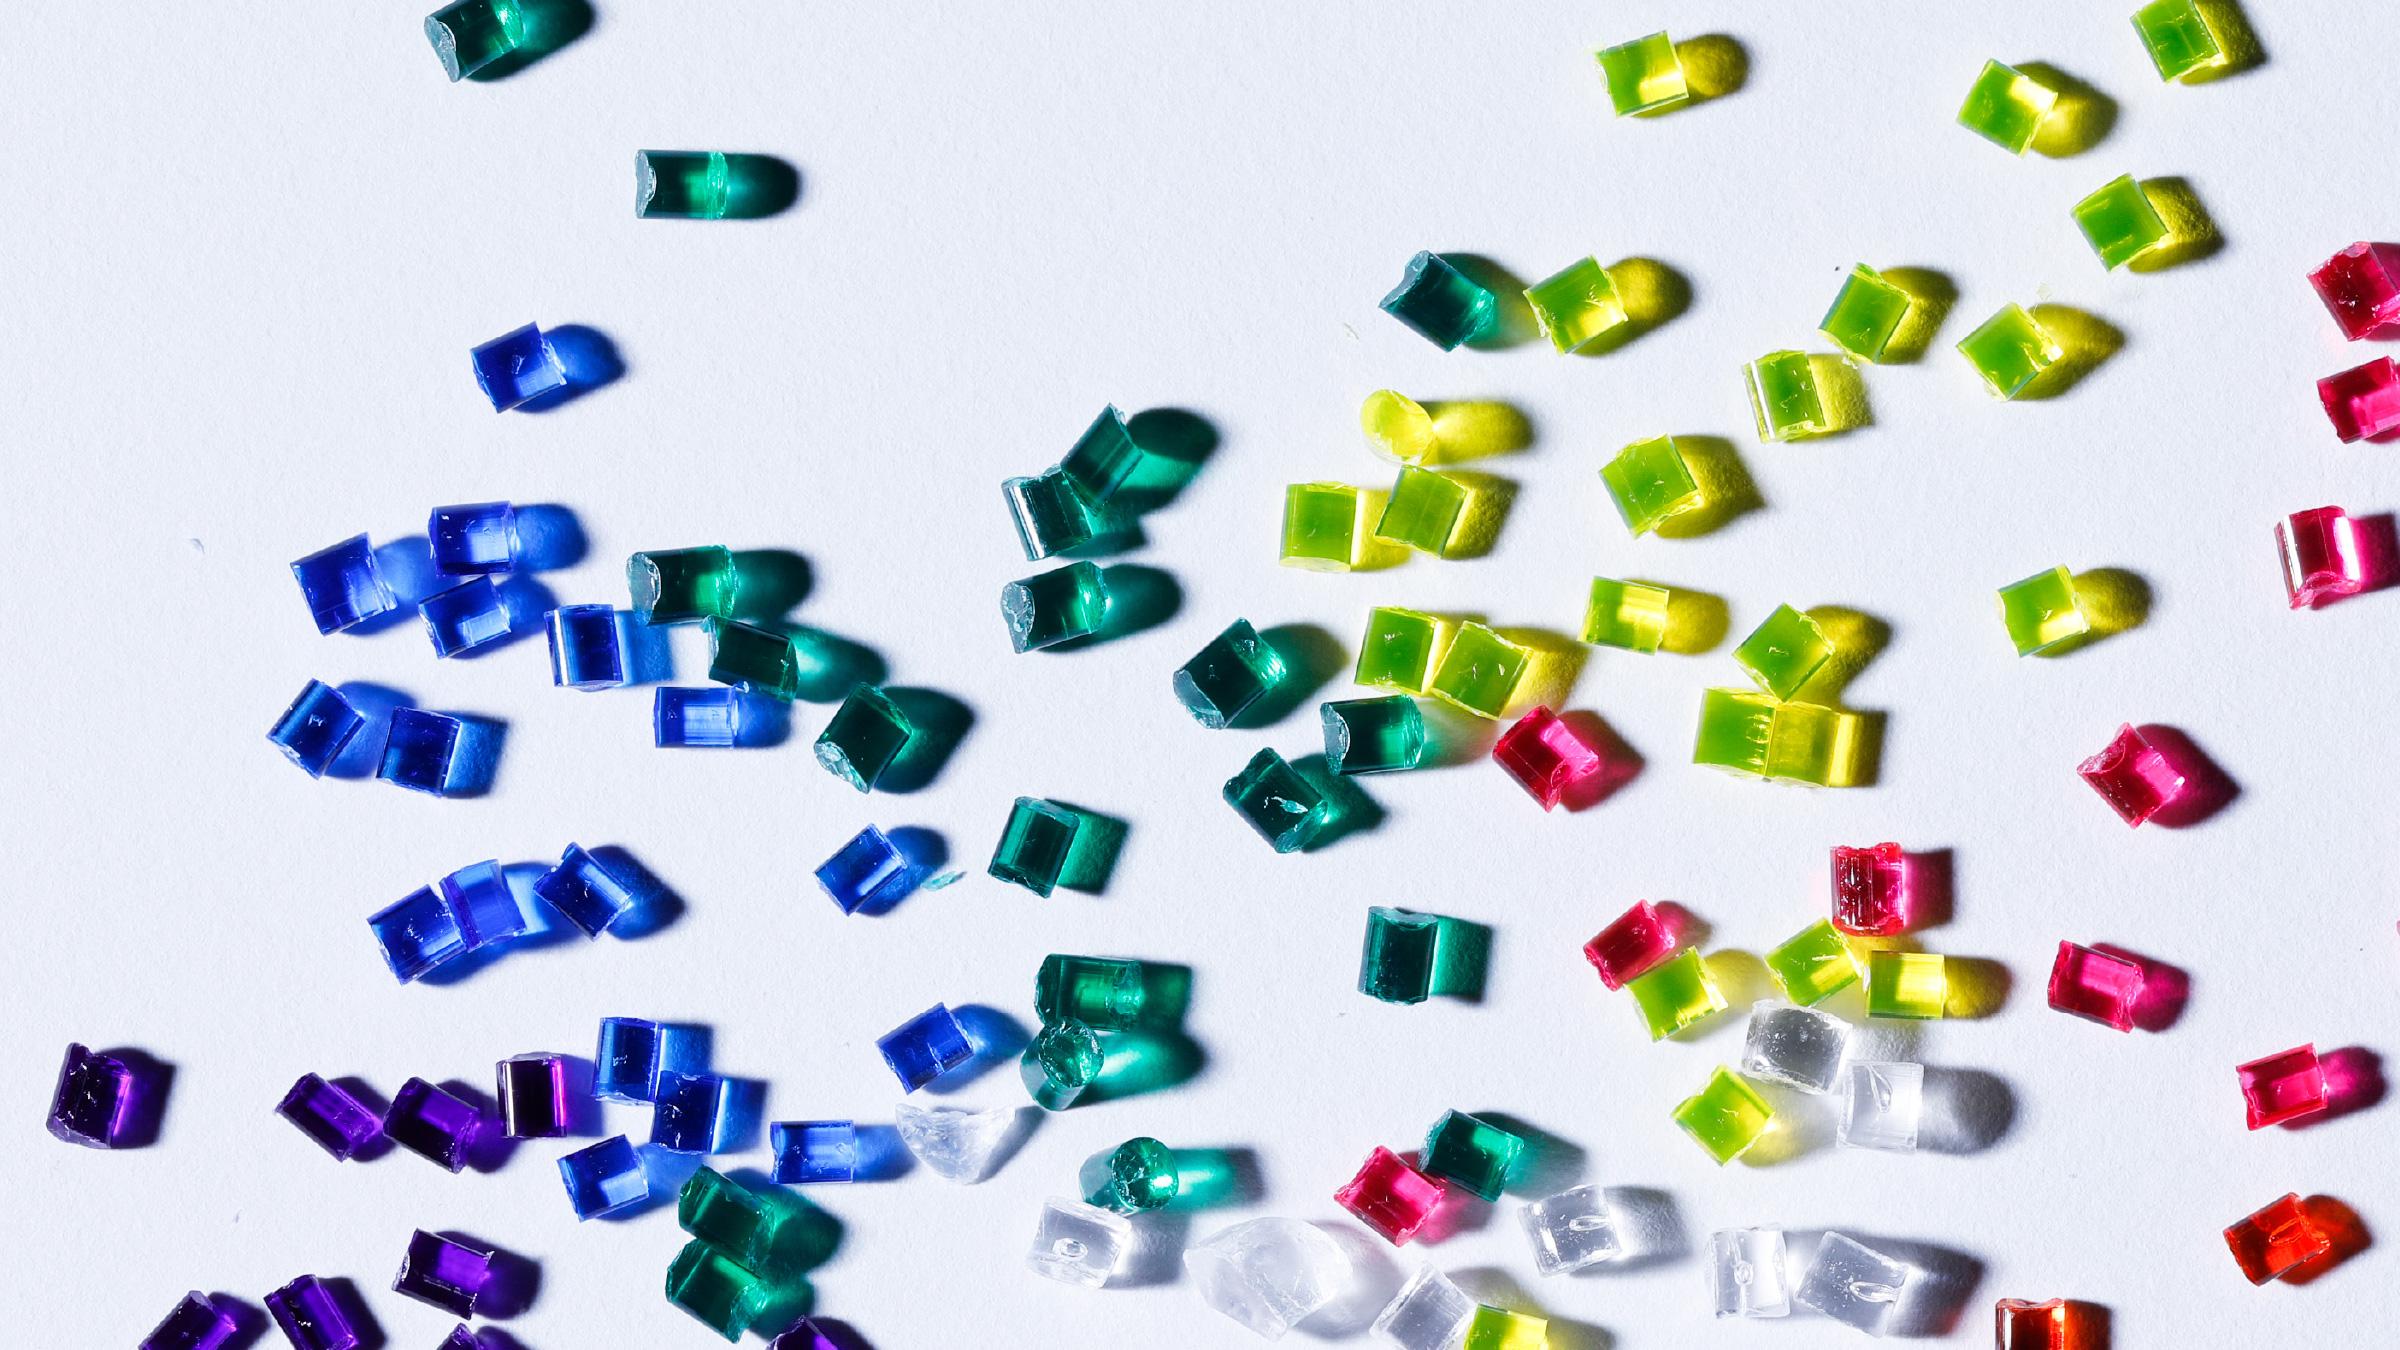 PLASTIC IS 光を味方につけ狙いどおりの色を再現できる。